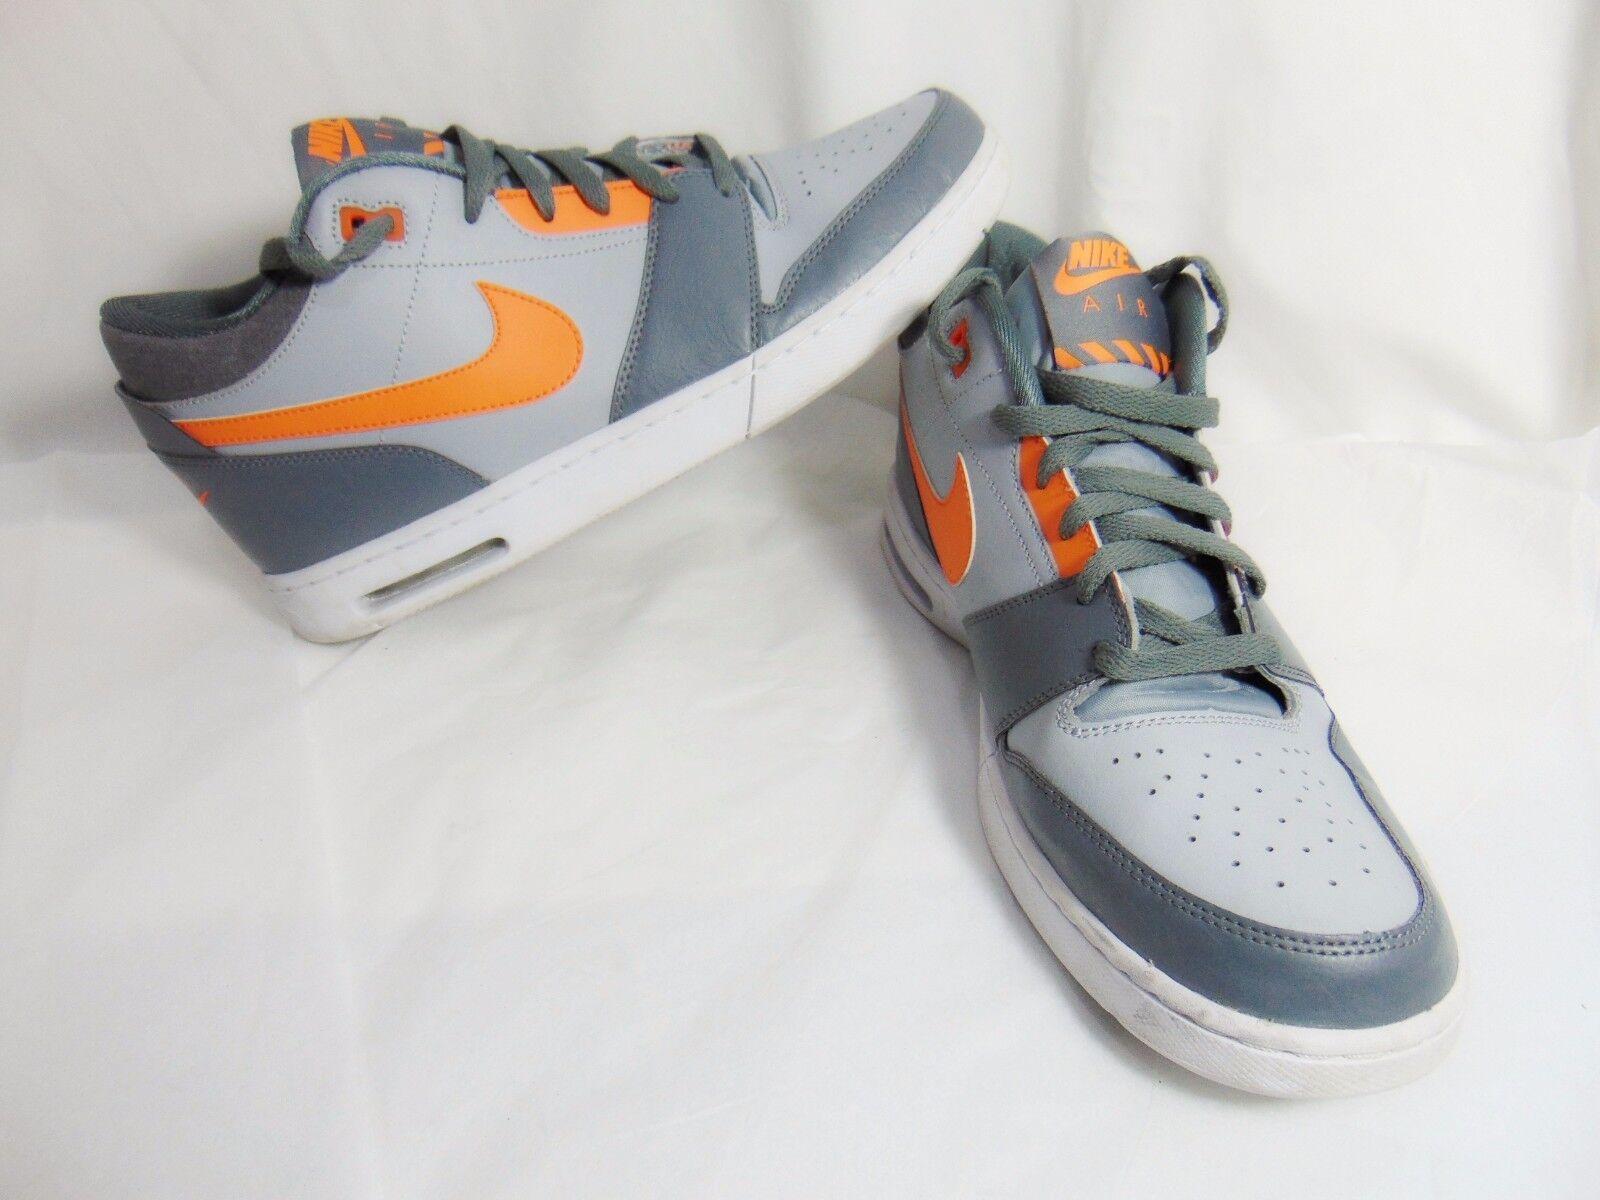 Nike air stepback männer sportschuhe turnschuhe 11,5 11,5 11,5 m gray orange 654476 080 8e290b